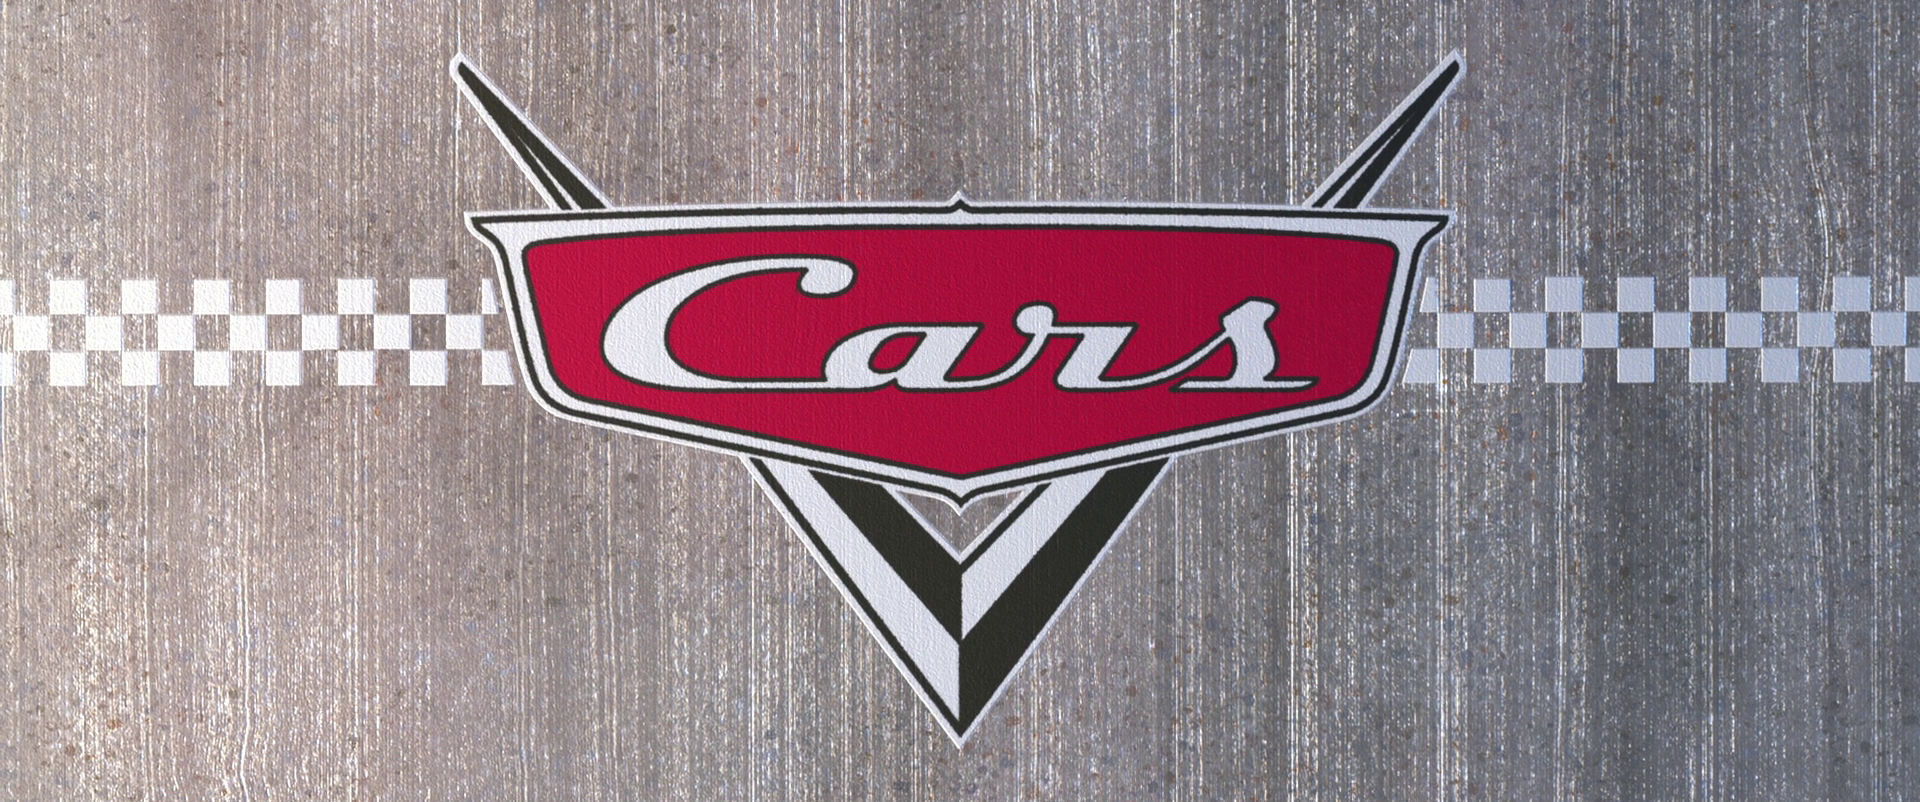 Cars Title Card